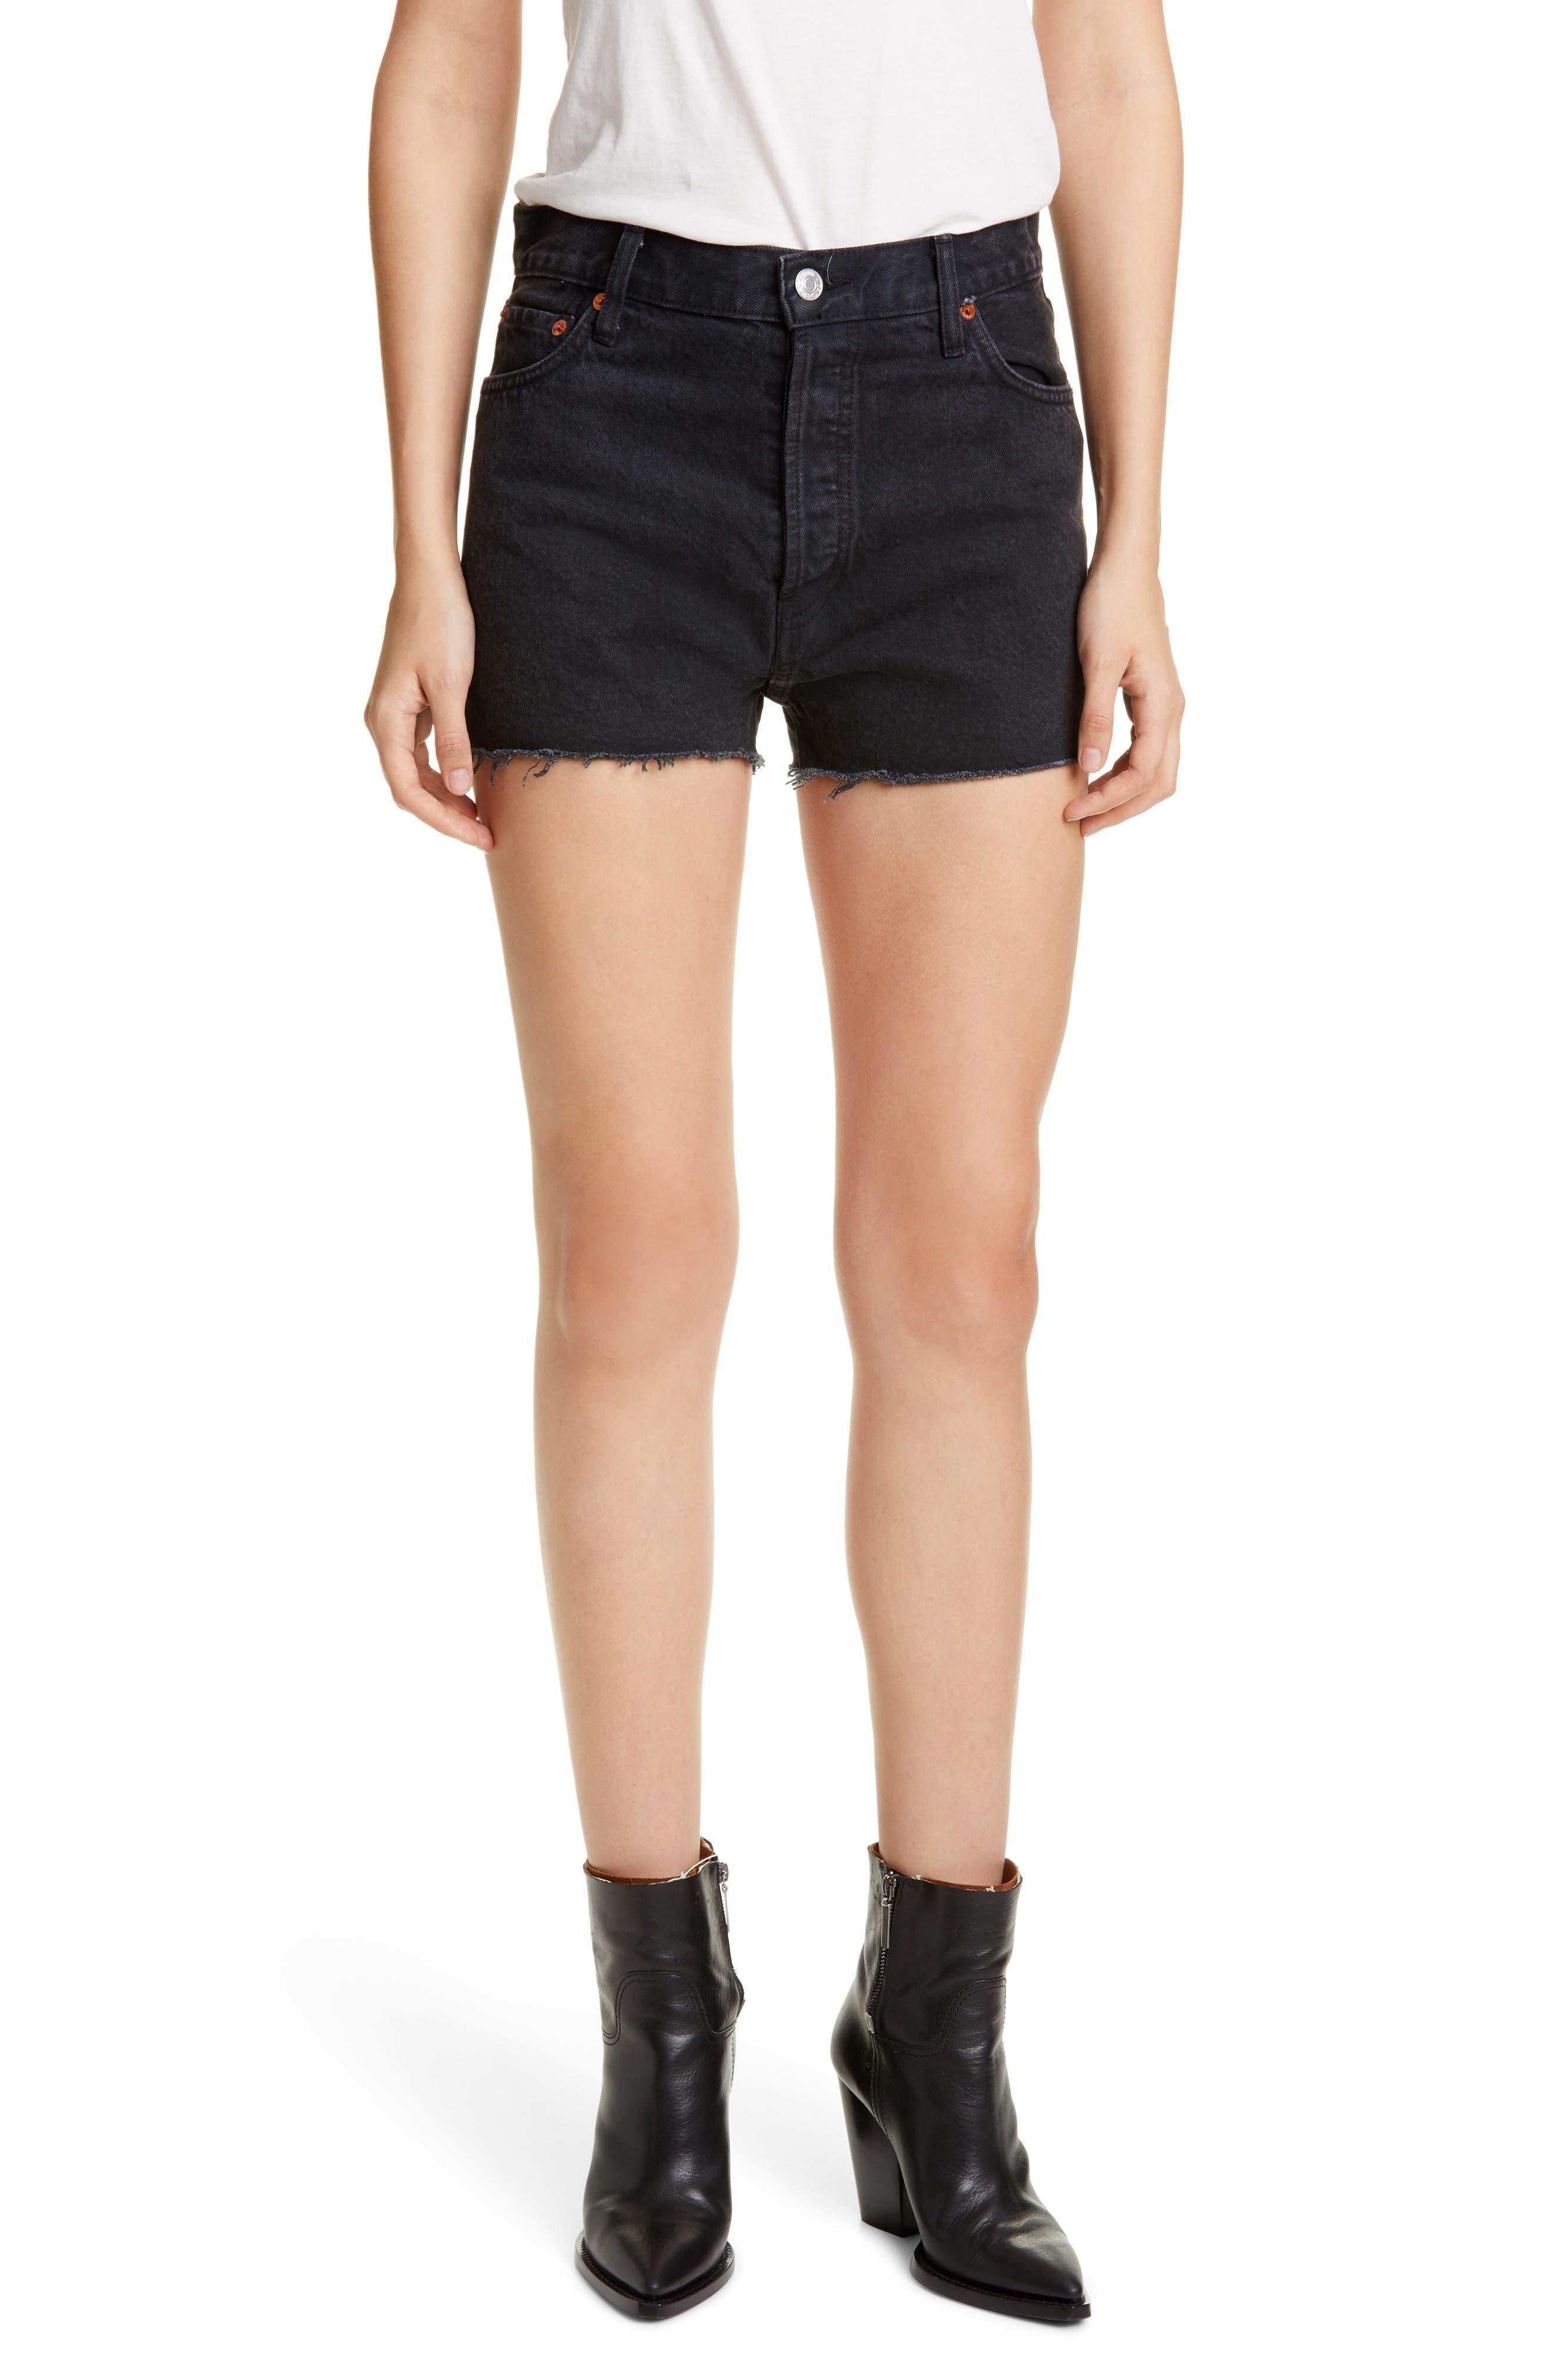 Vintage Shorts, Culottes,  Capris History Womens Redone High Waist Cutoff Denim Shorts $195.00 AT vintagedancer.com